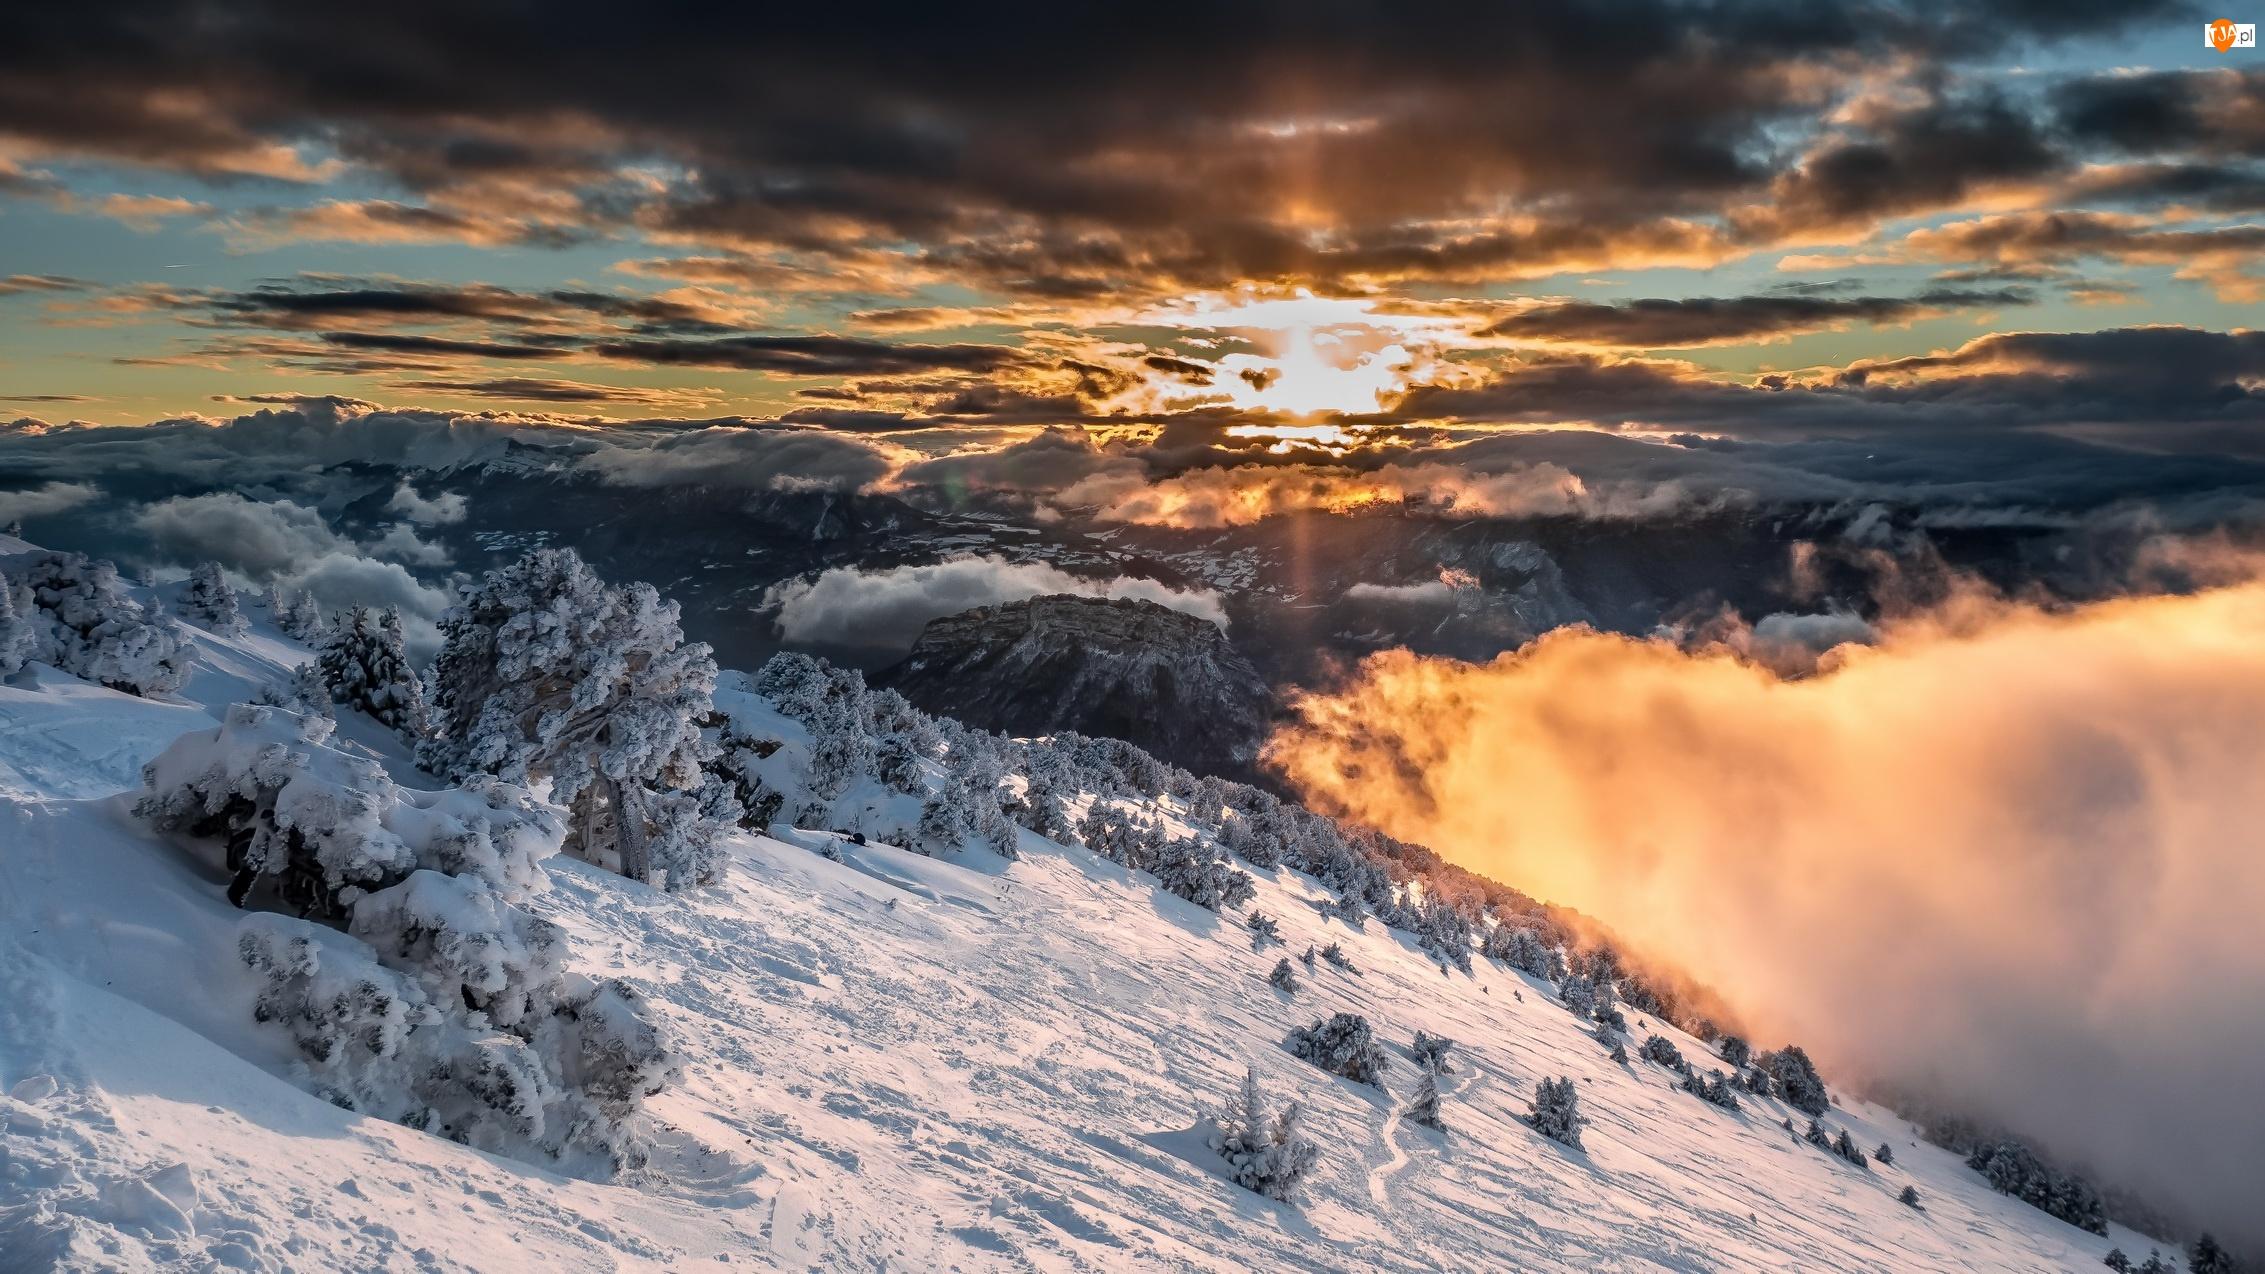 Stok, Zachód słońca, Góry, Zima, Chmury